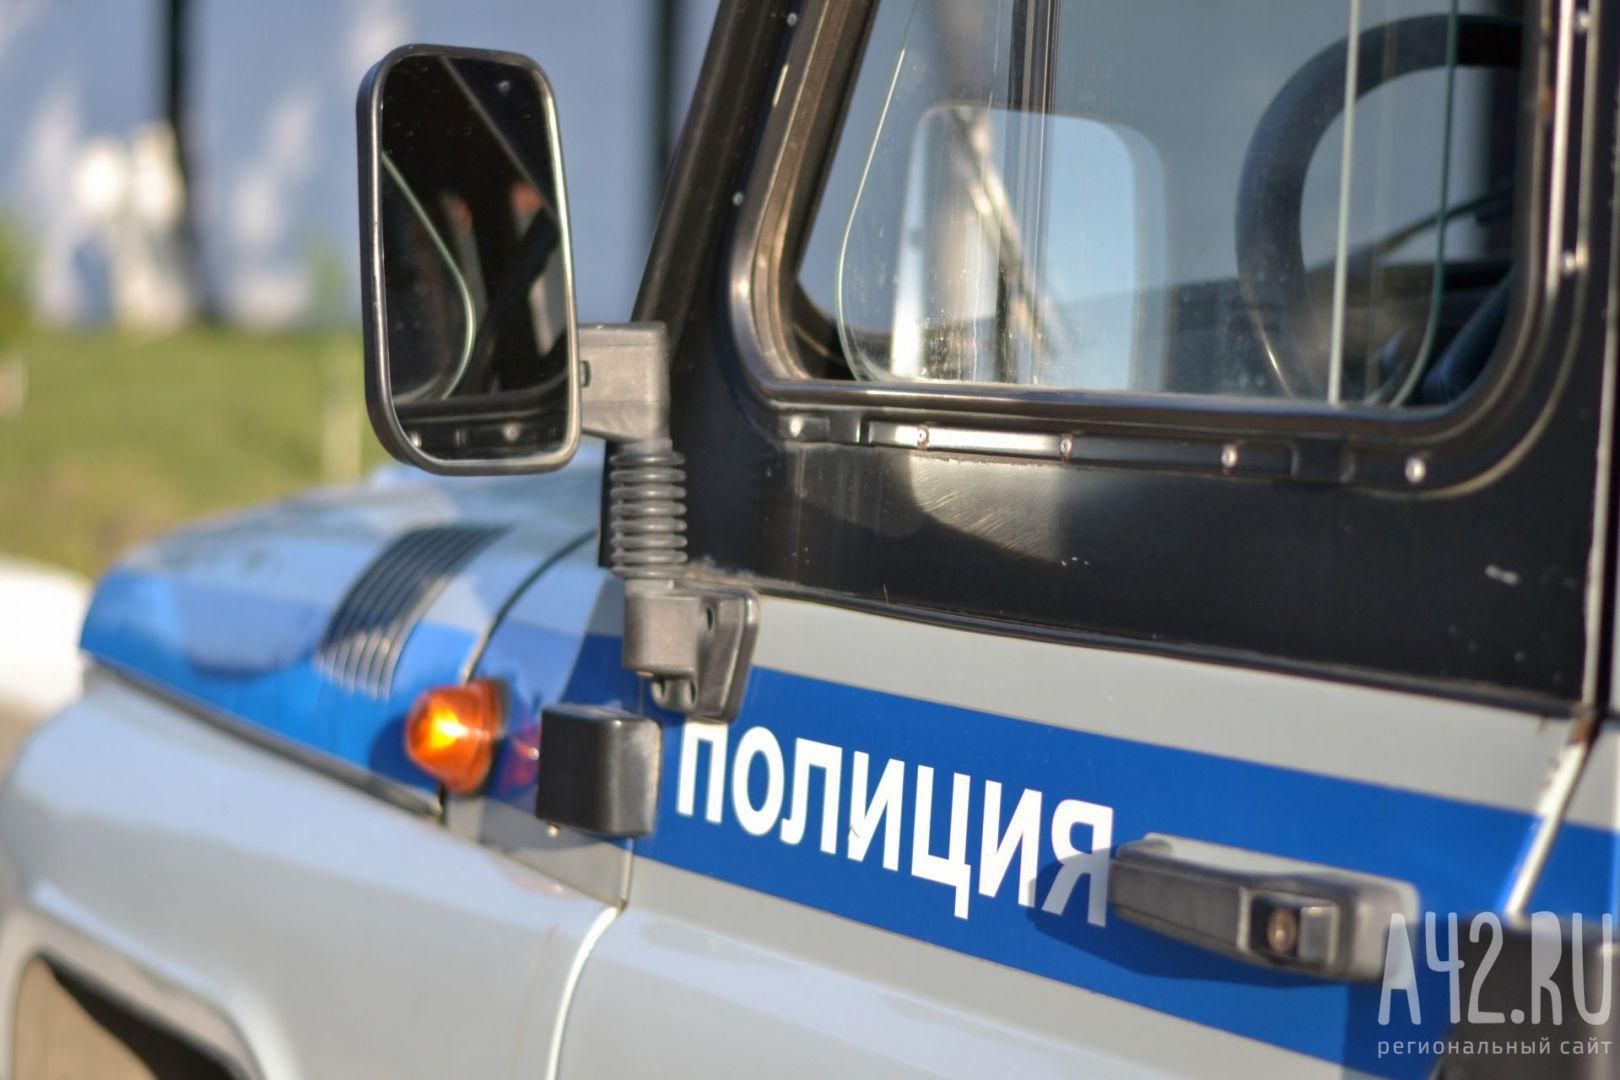 ВКузбассе опрокинулся микроавтобус— один умер, семеро пострадали